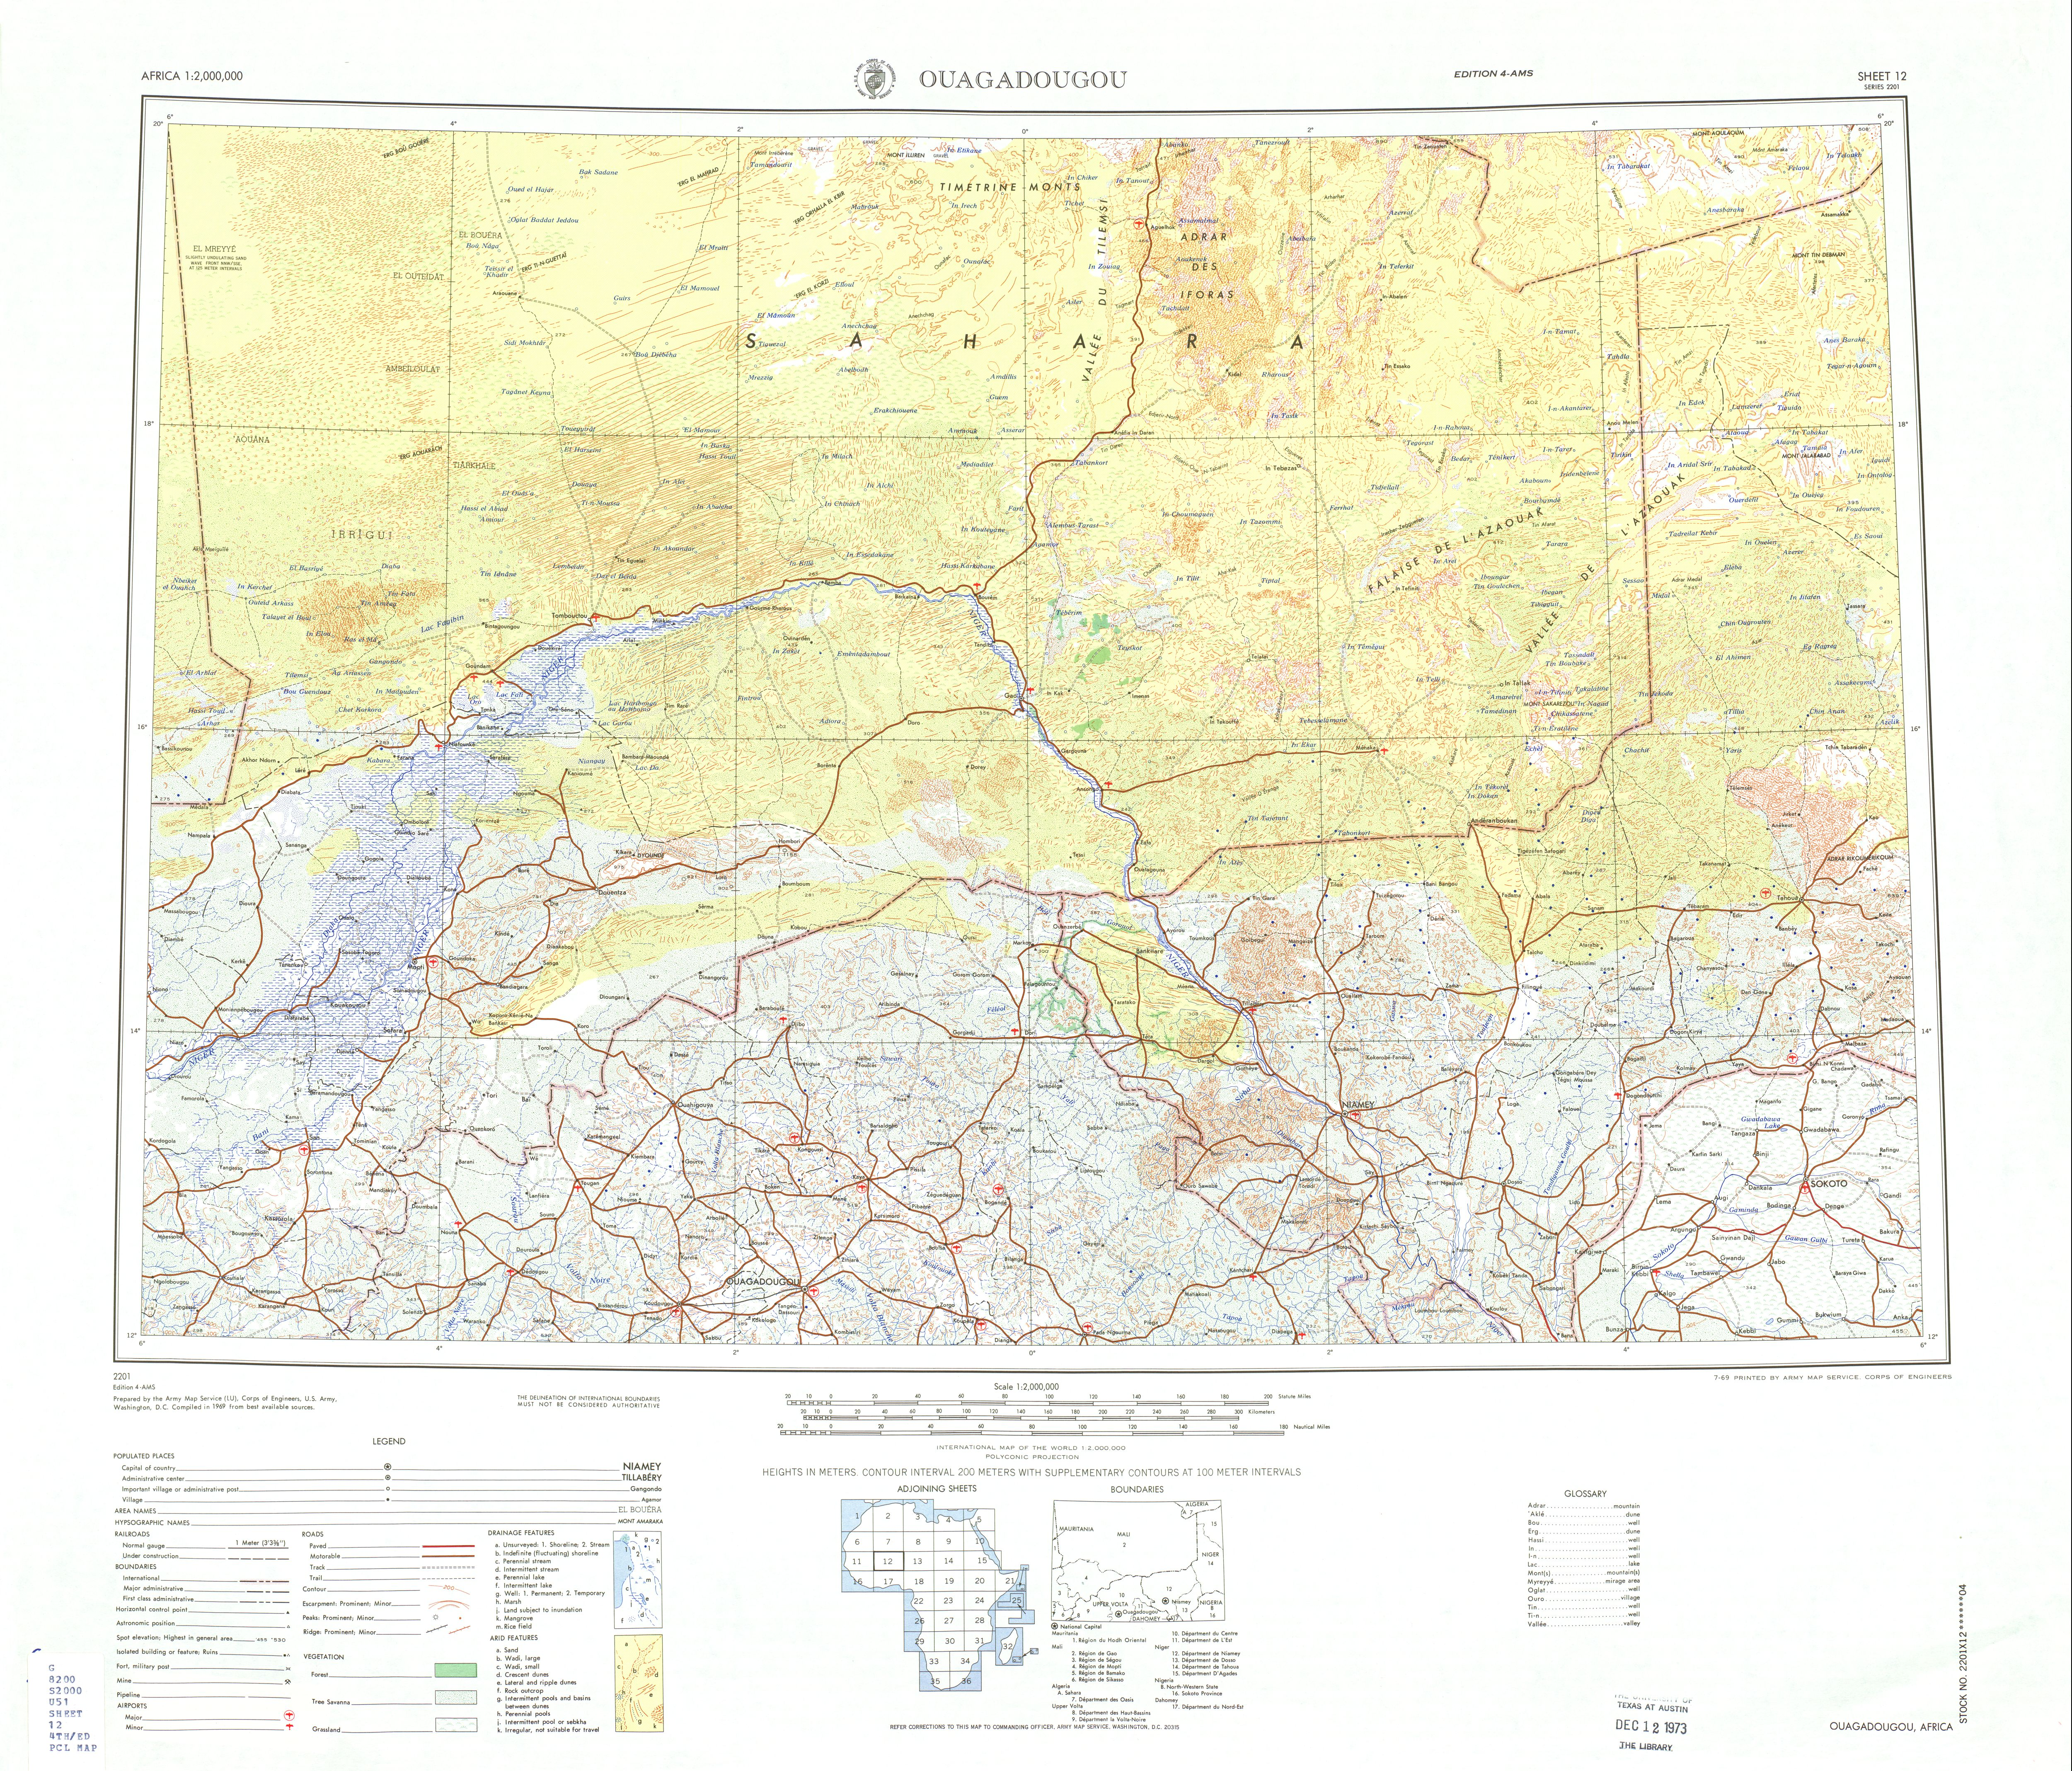 Hoja Uagadugú del Mapa Topográfico de África 1969